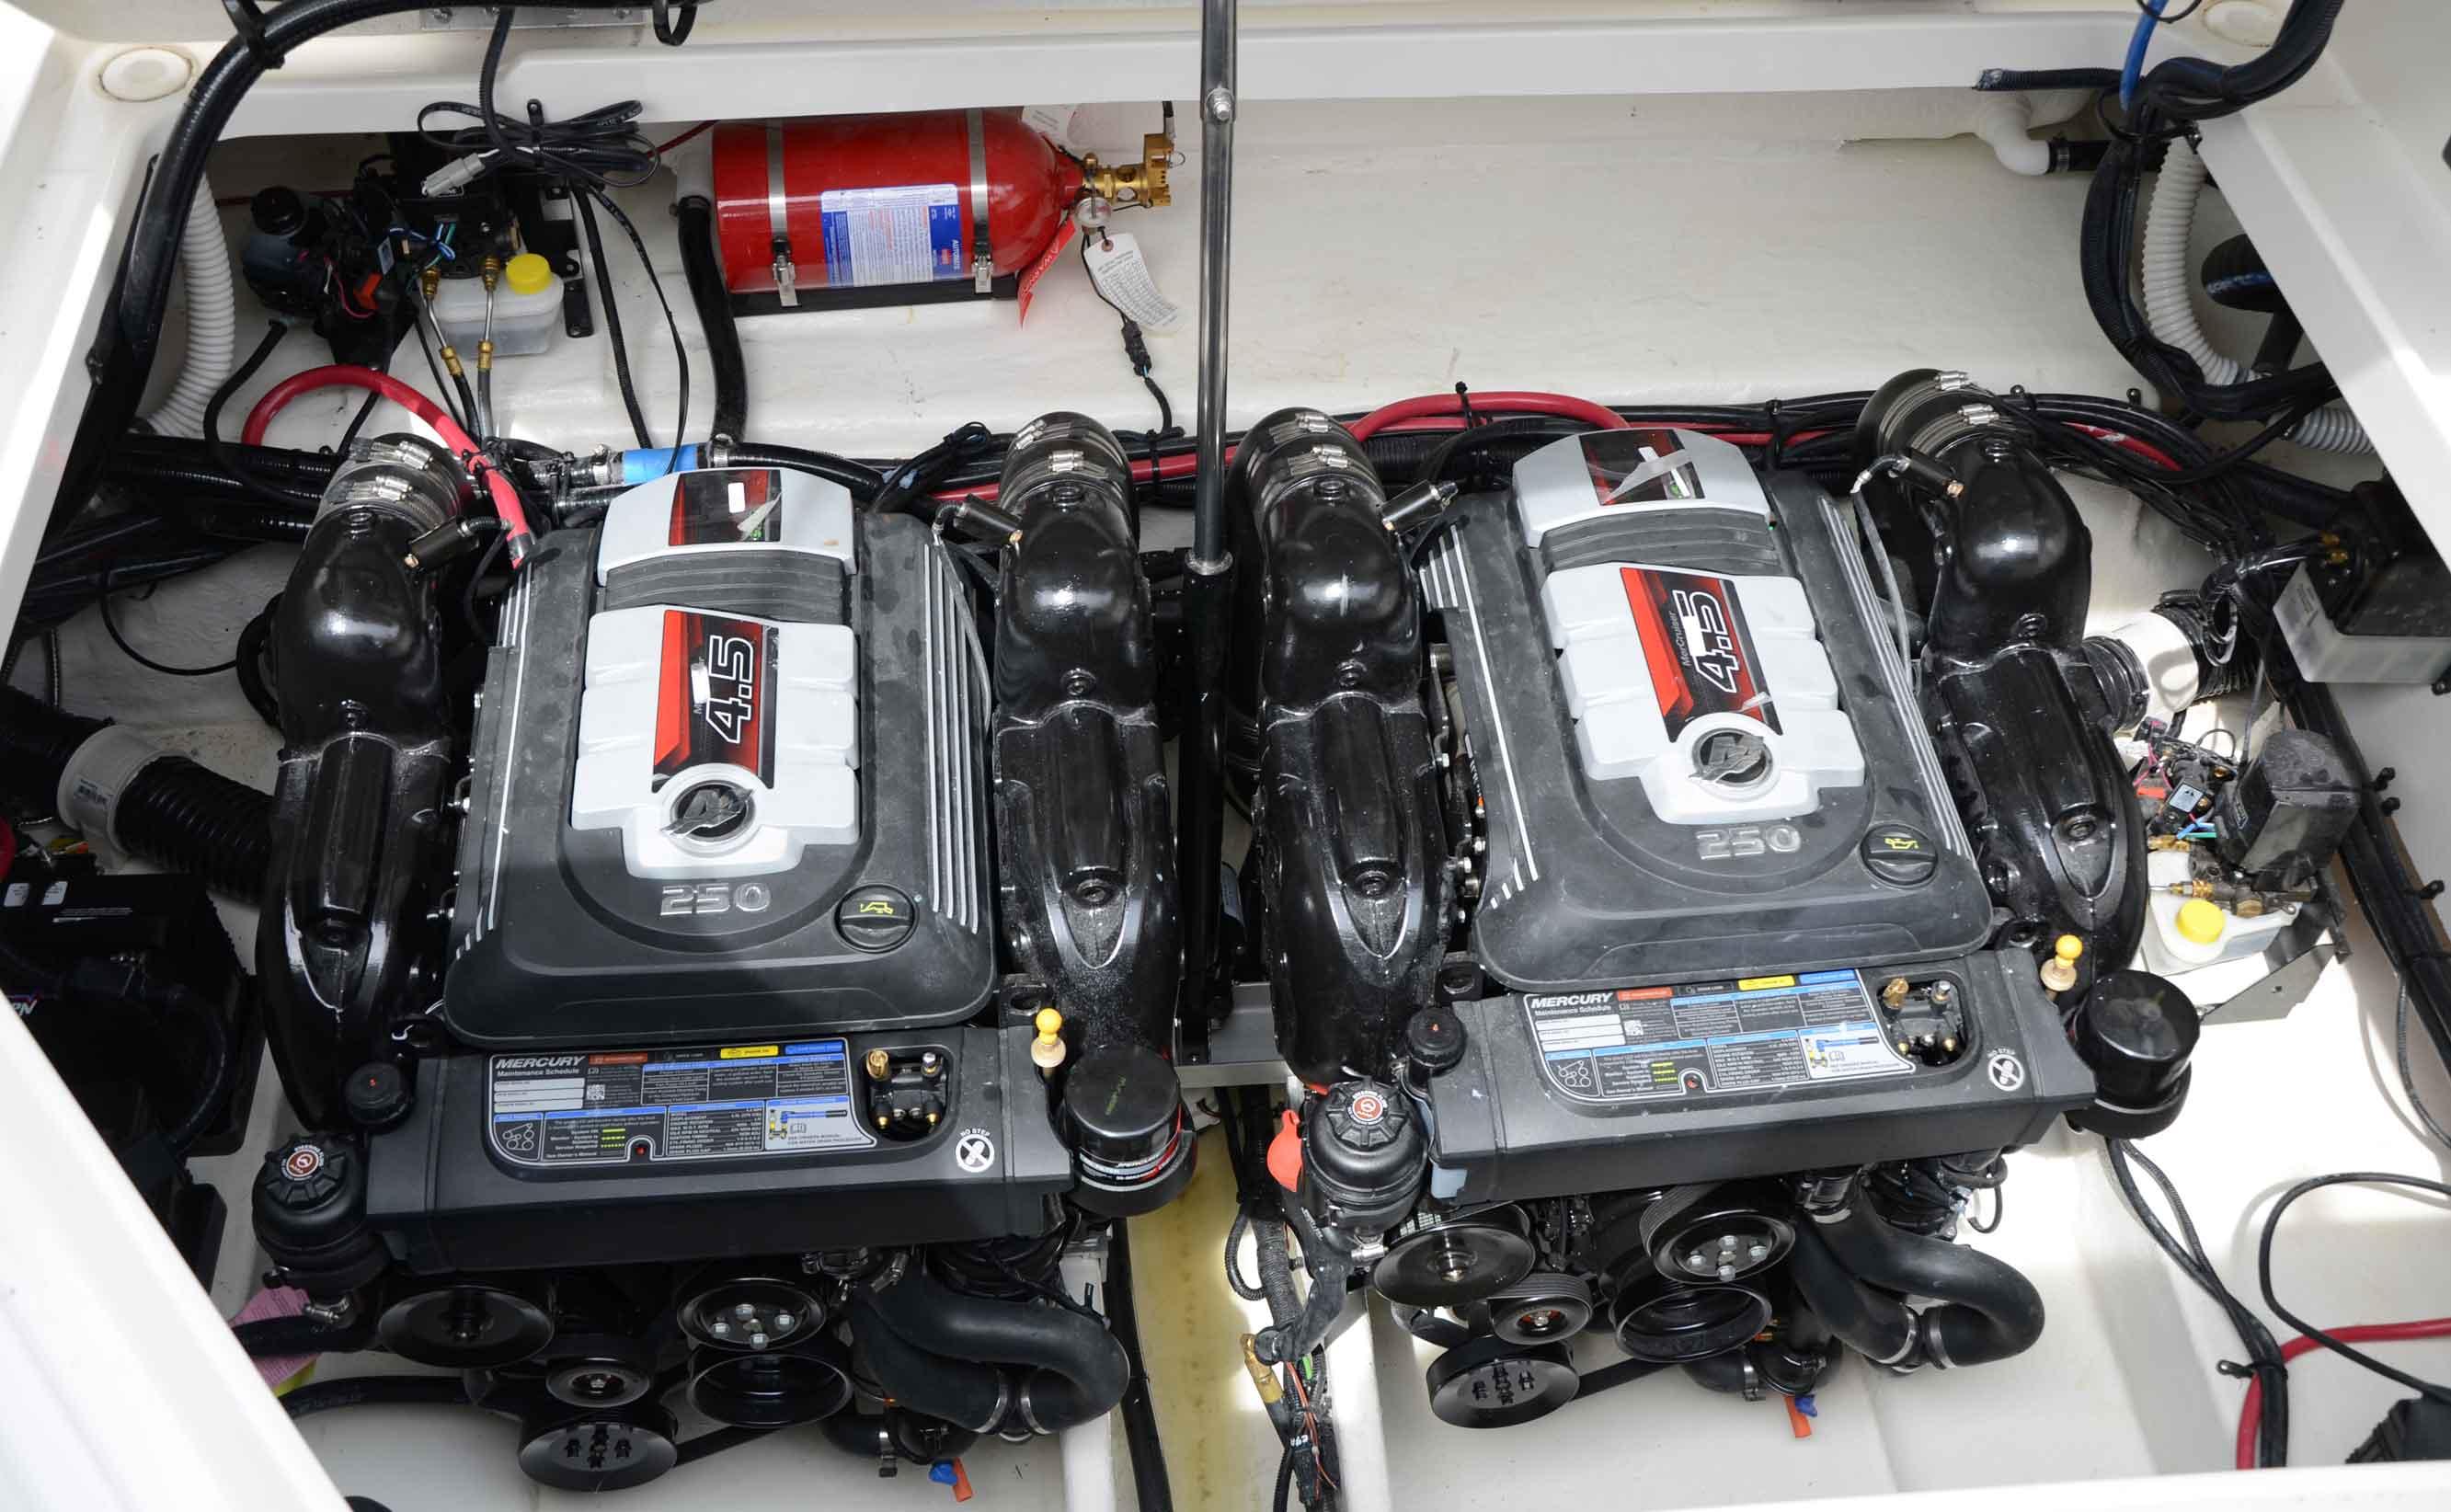 New Mercruiser 45l V6 250 Hp Simple Compact Strong Boatmag 5 0 Tachometer Wiring Mercury 45 L Cv